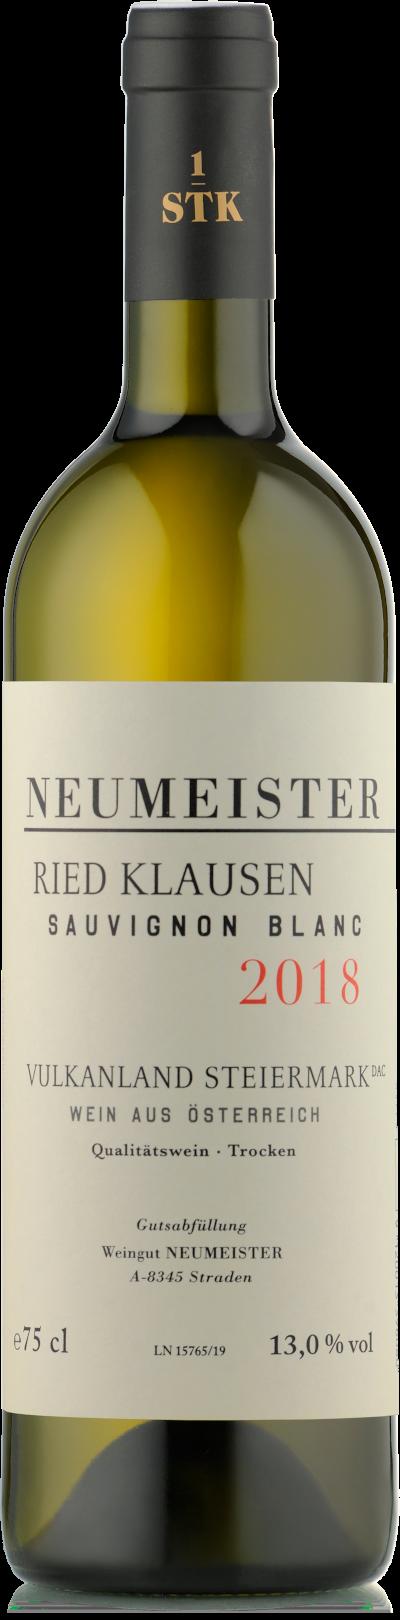 Neumeister - Sauvignon Blanc Ried Klausen bio